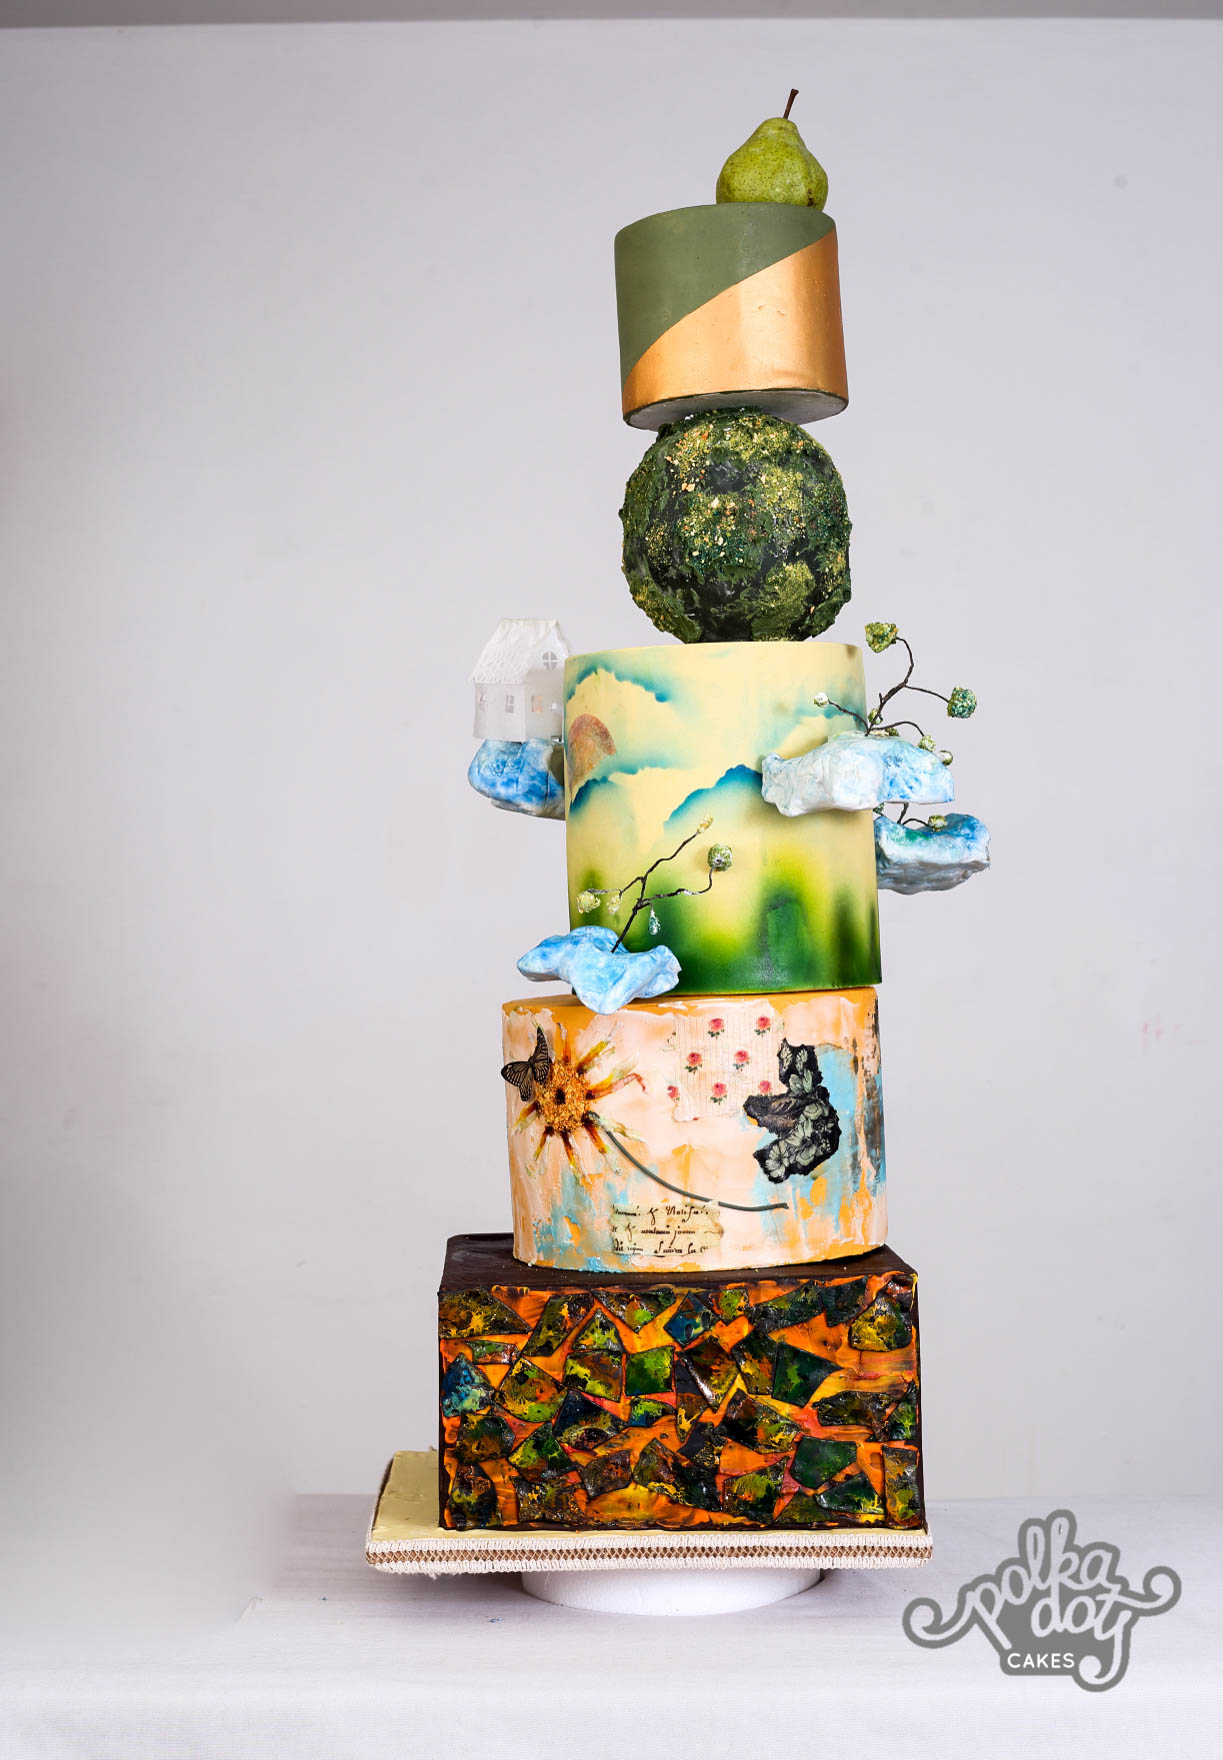 Priyanka-Arora-Polka-Dots-Cakes-Academy-Novelty-Specialty-0.jpg#asset:16128